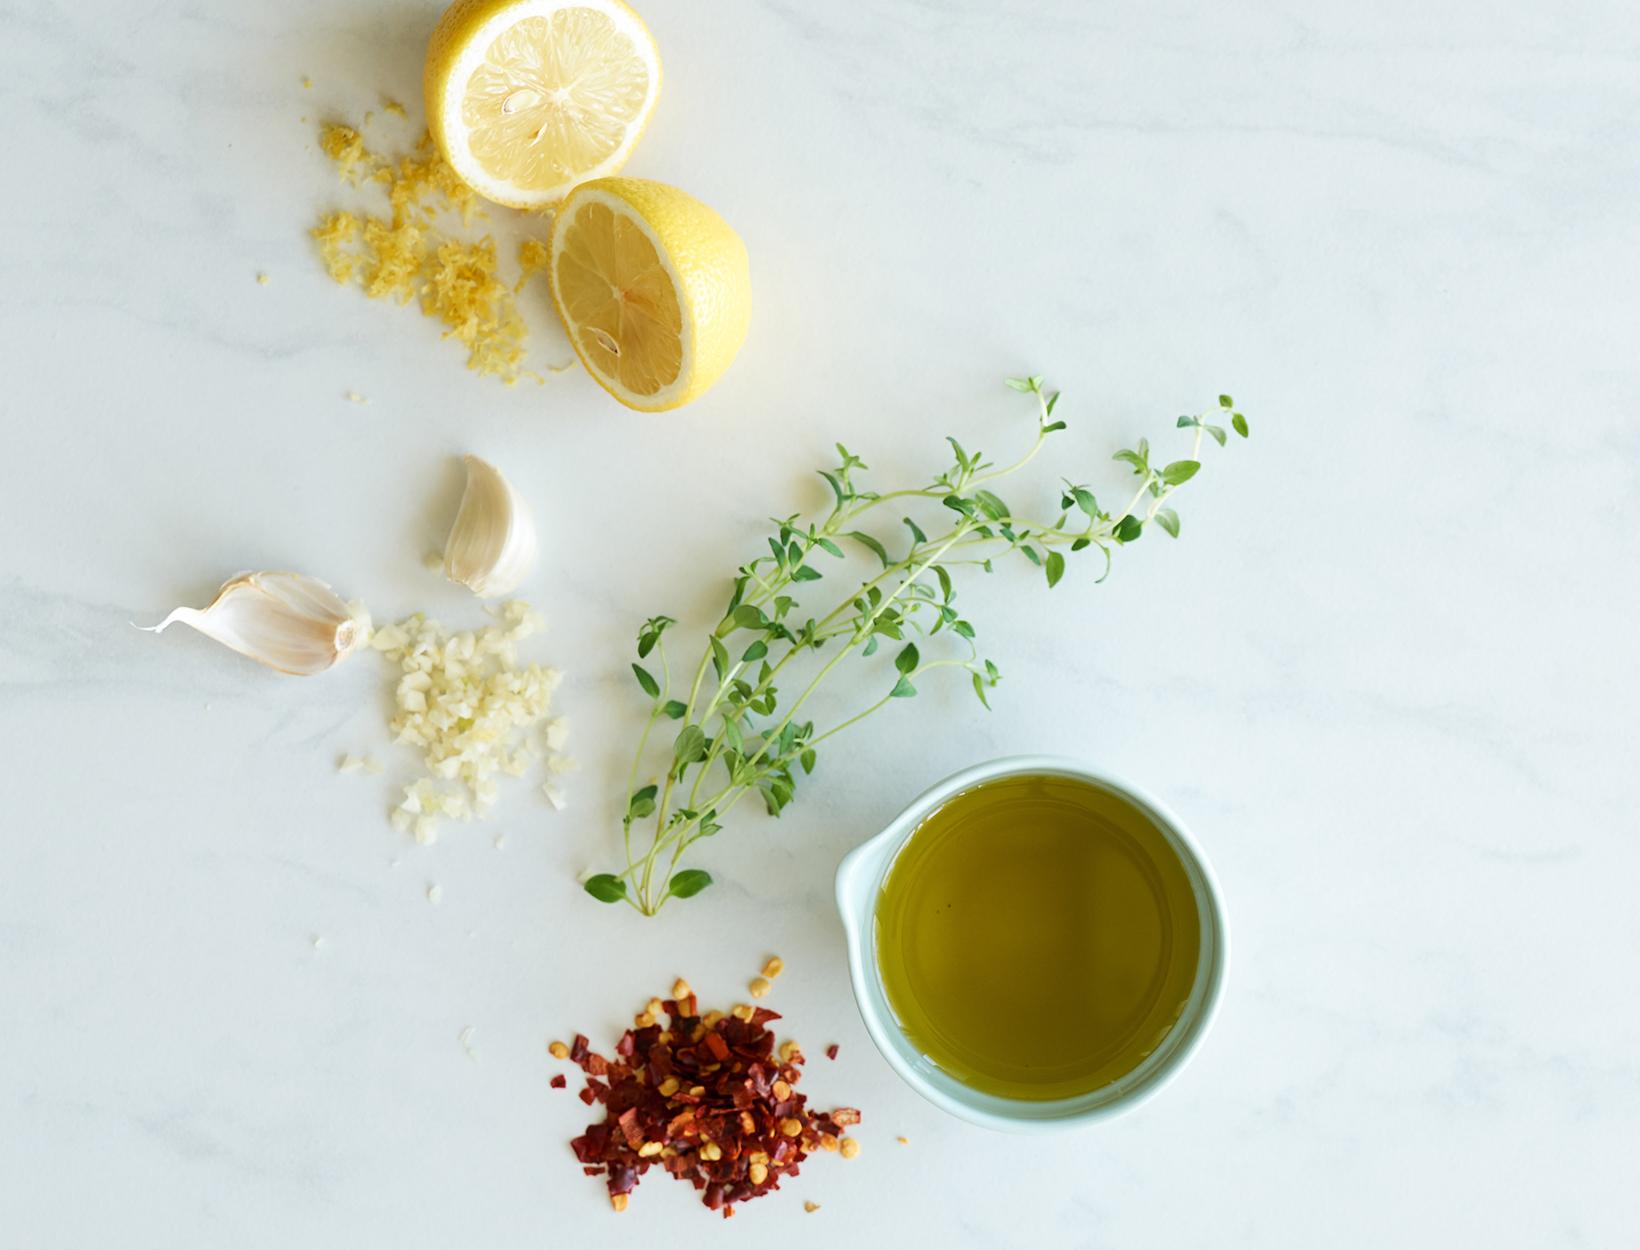 Lemon, Garlic & Chili Marinade